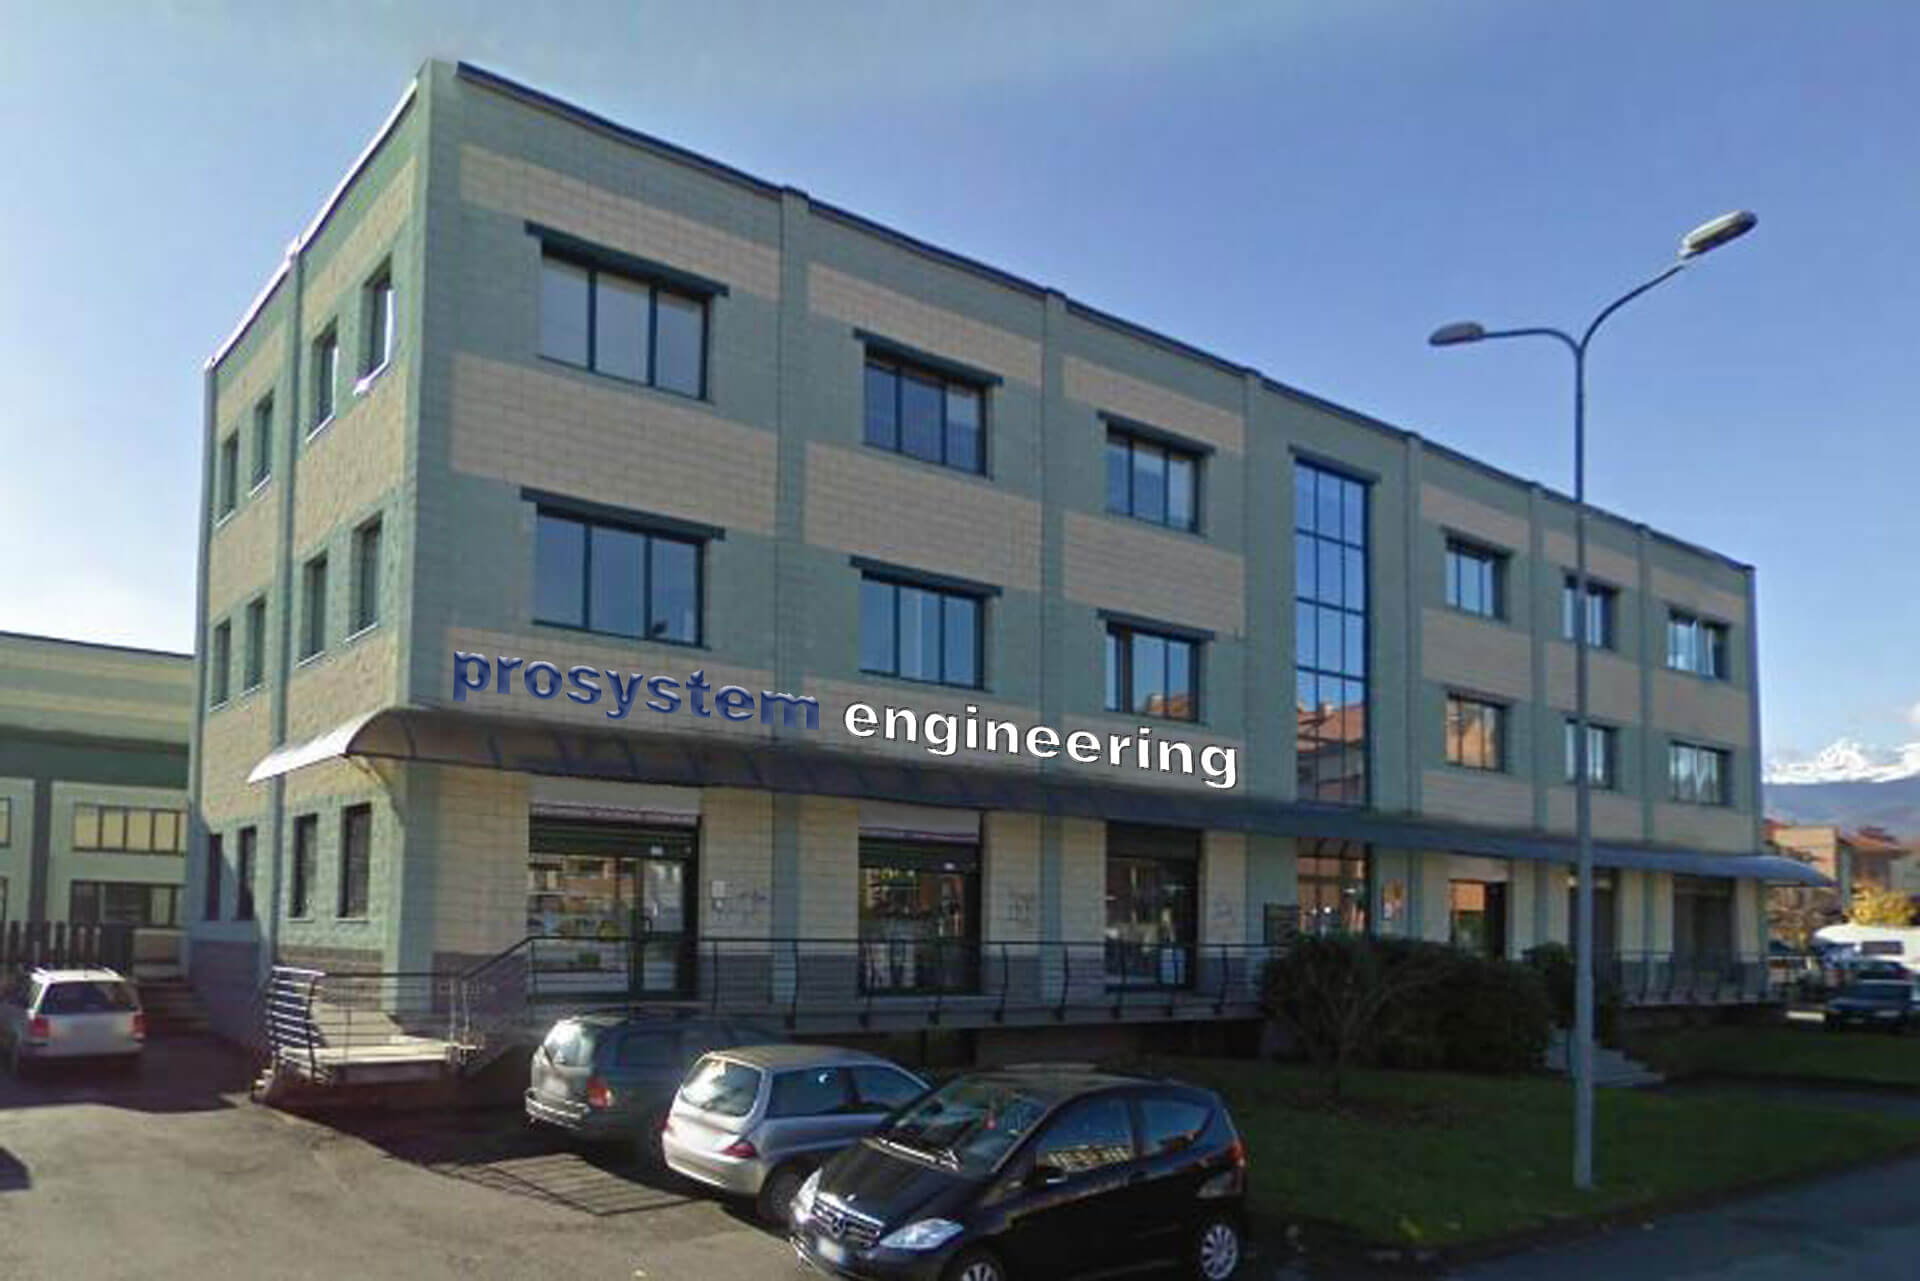 Uffici Prosystem Engineering